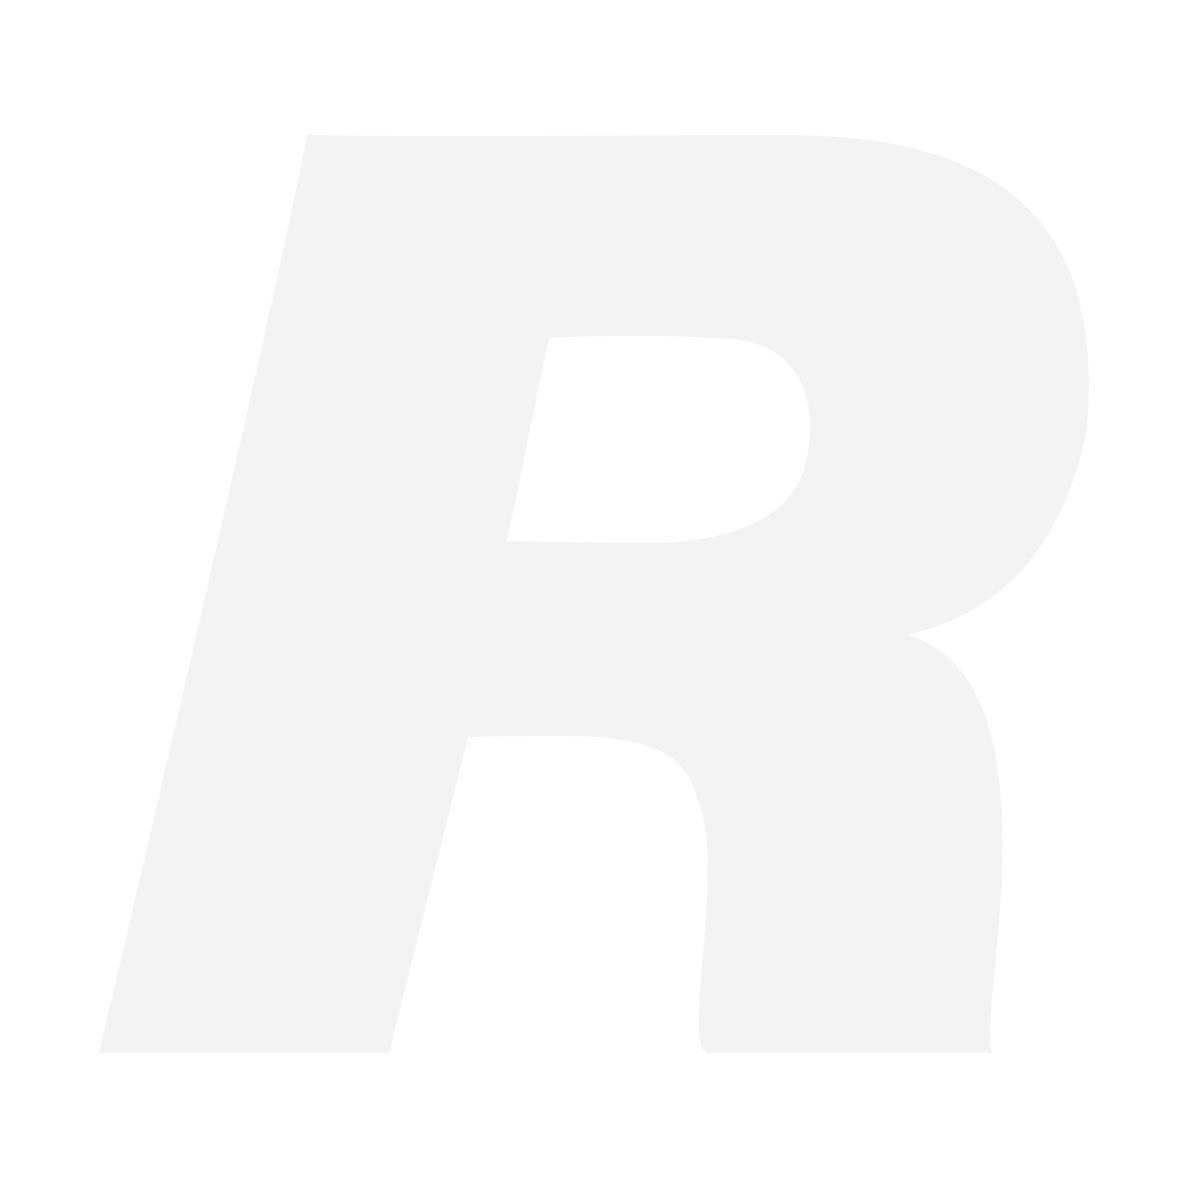 26129 ELINCHROM Portalite Softbox 66 cm